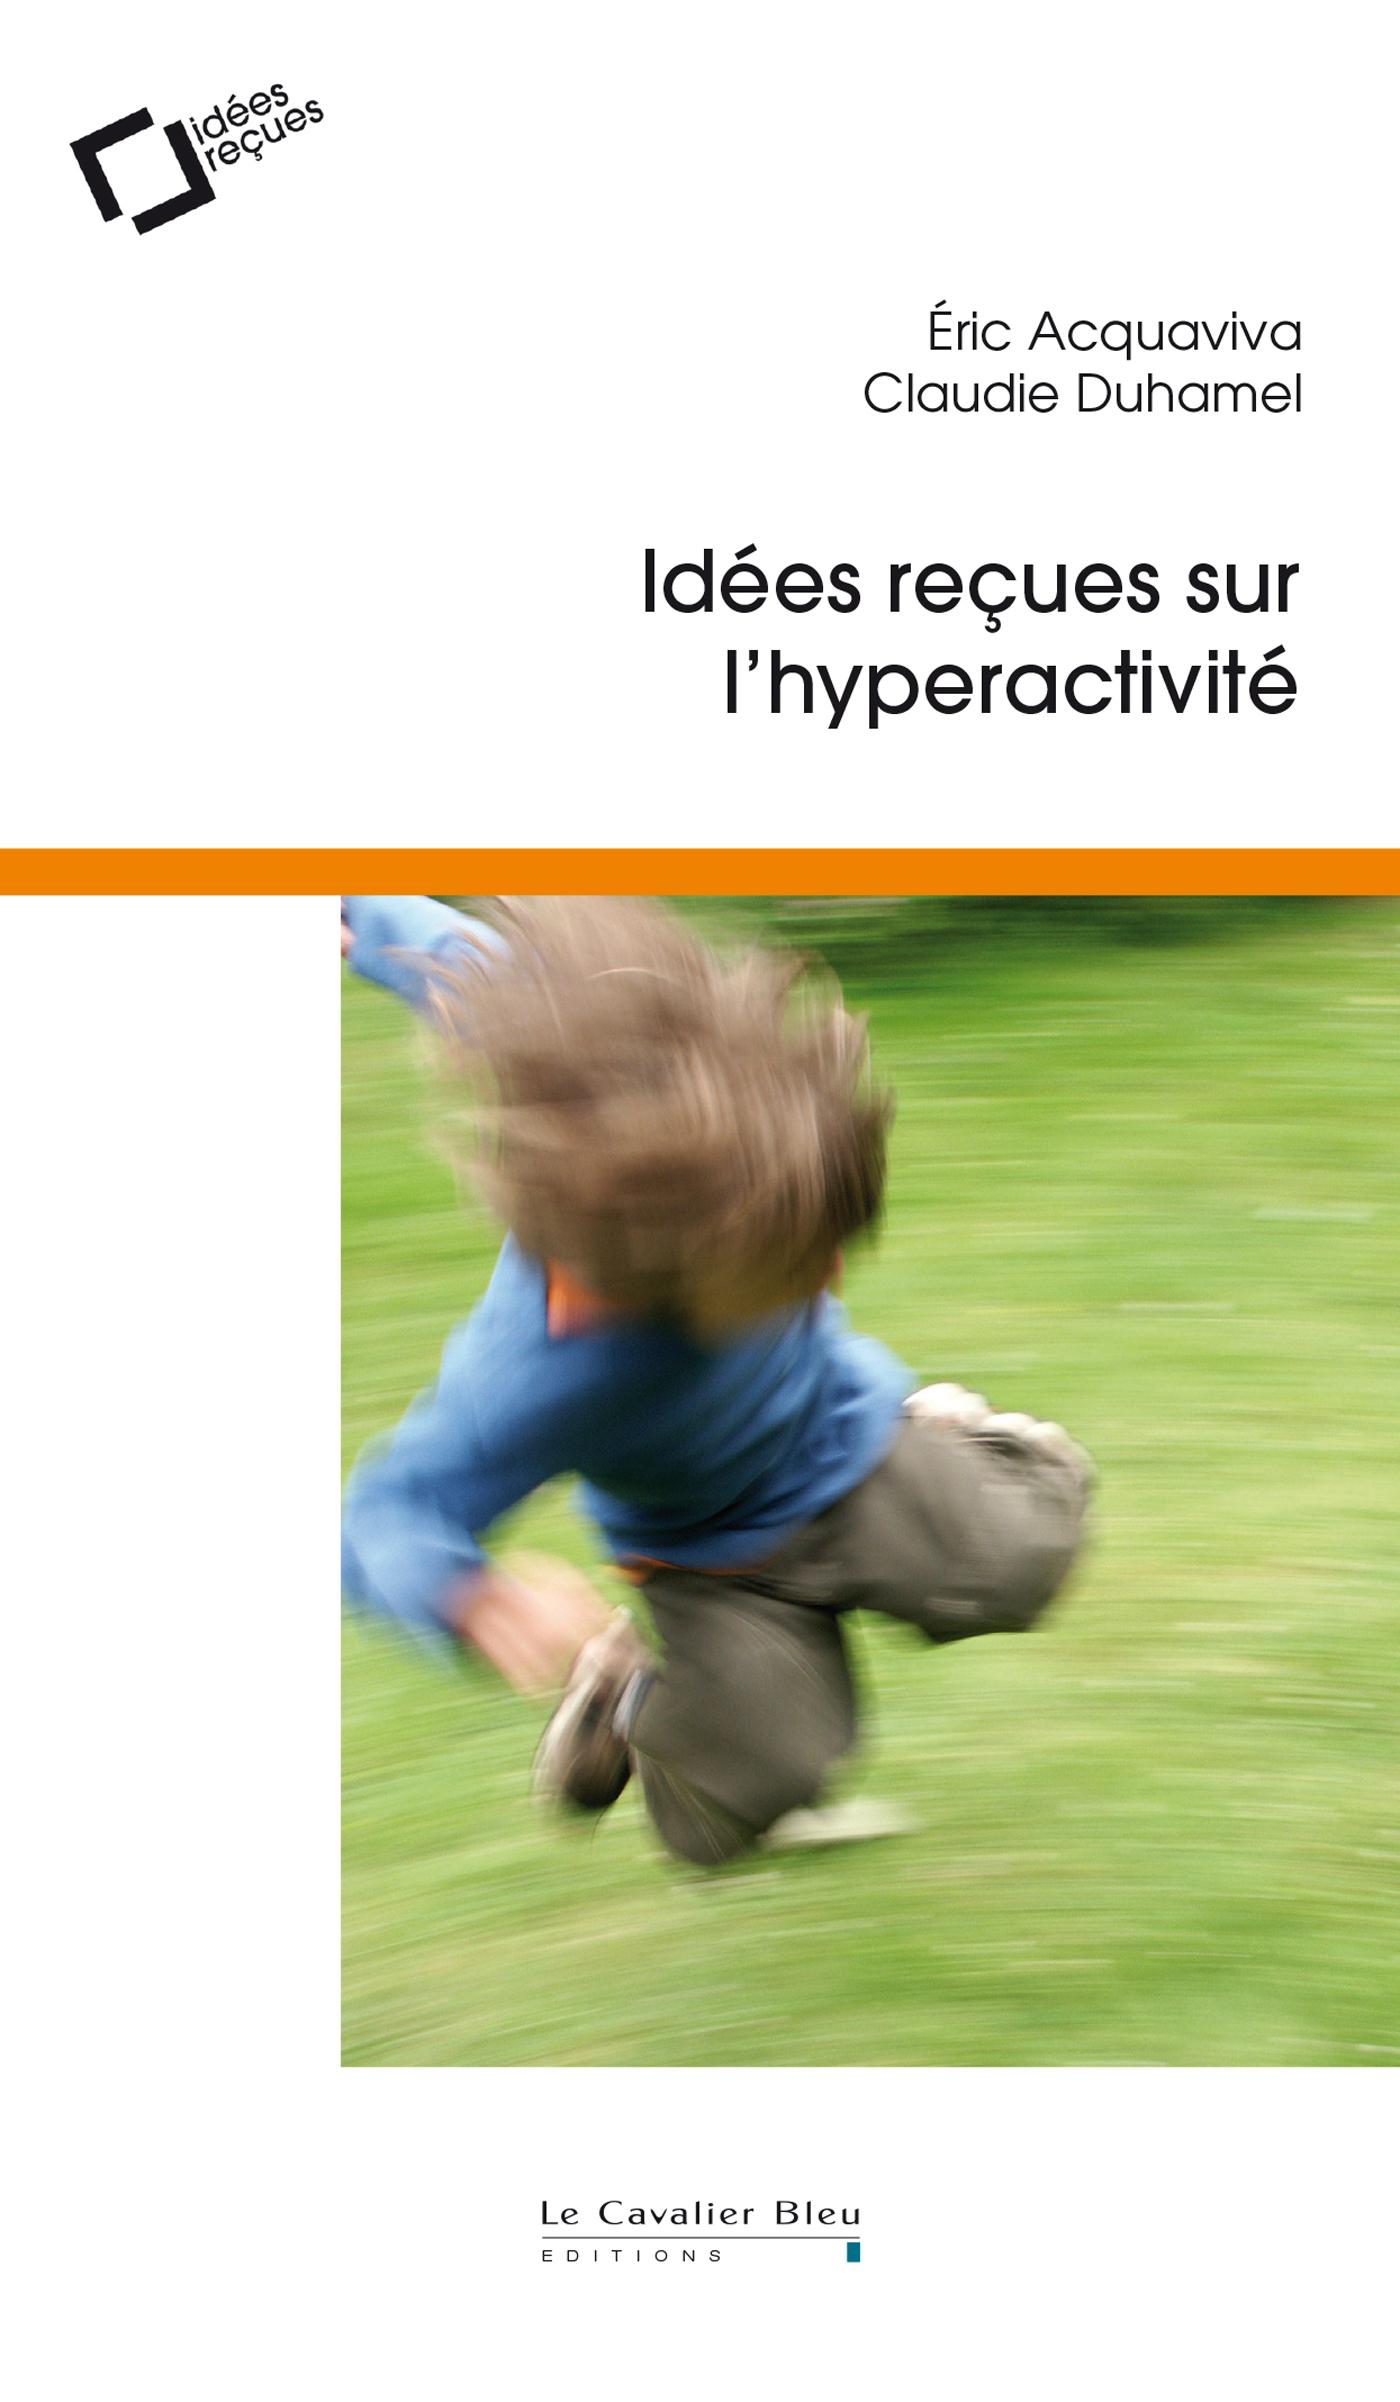 IDEES RECUES SUR L'HYPERACTIVITE